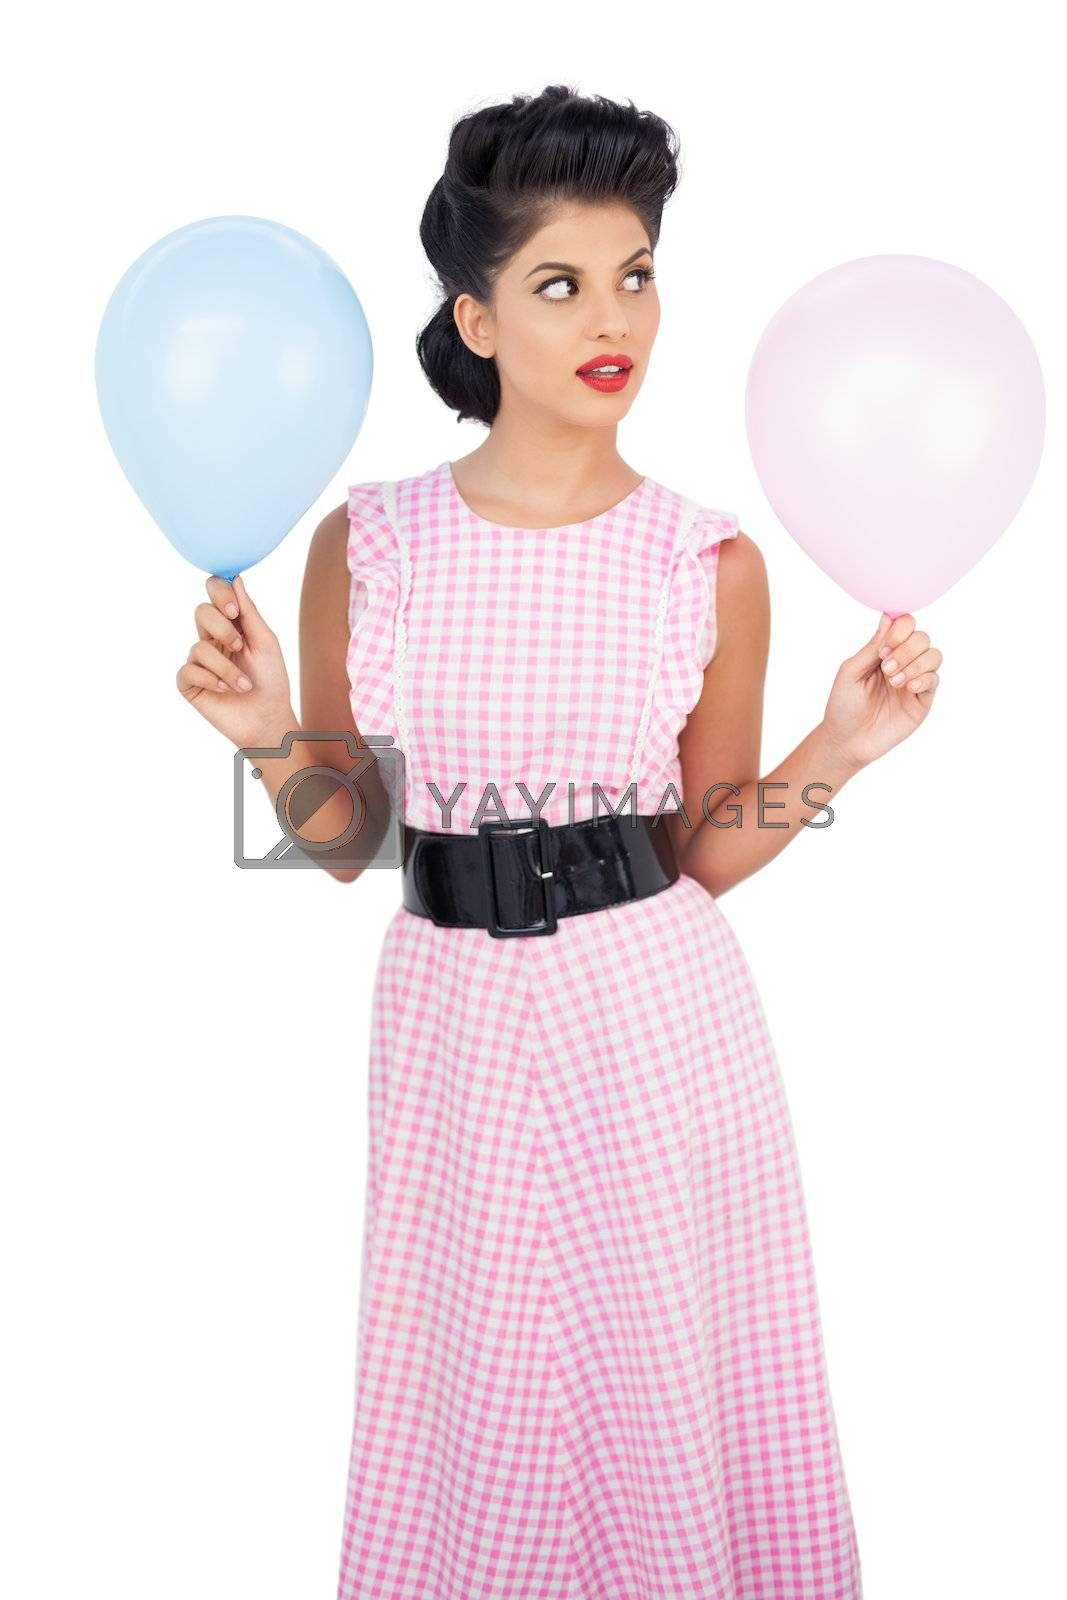 Thinking black hair model holding balloons by Wavebreakmedia